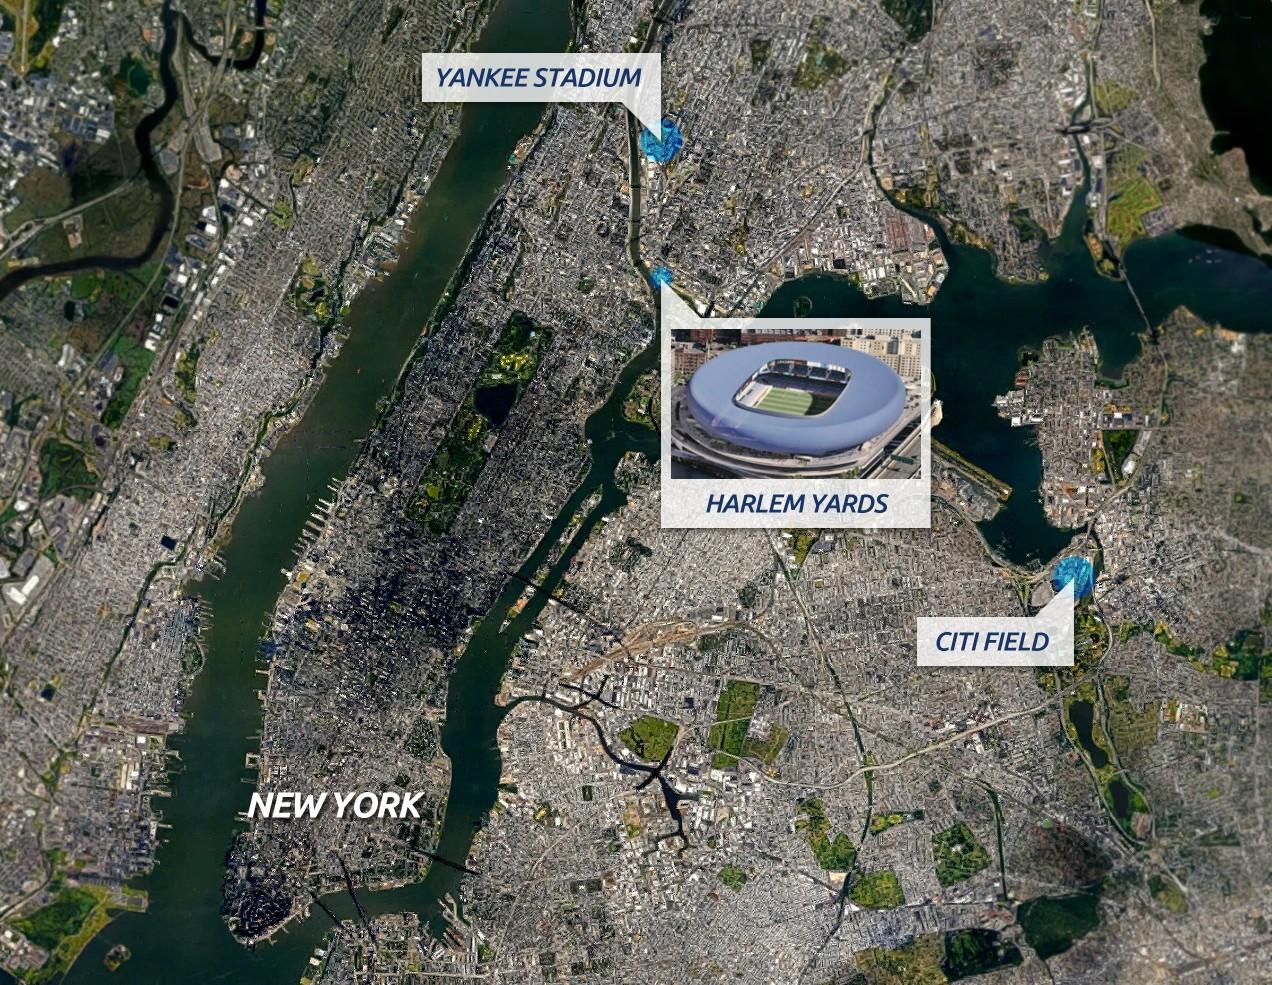 New York City FC stadium